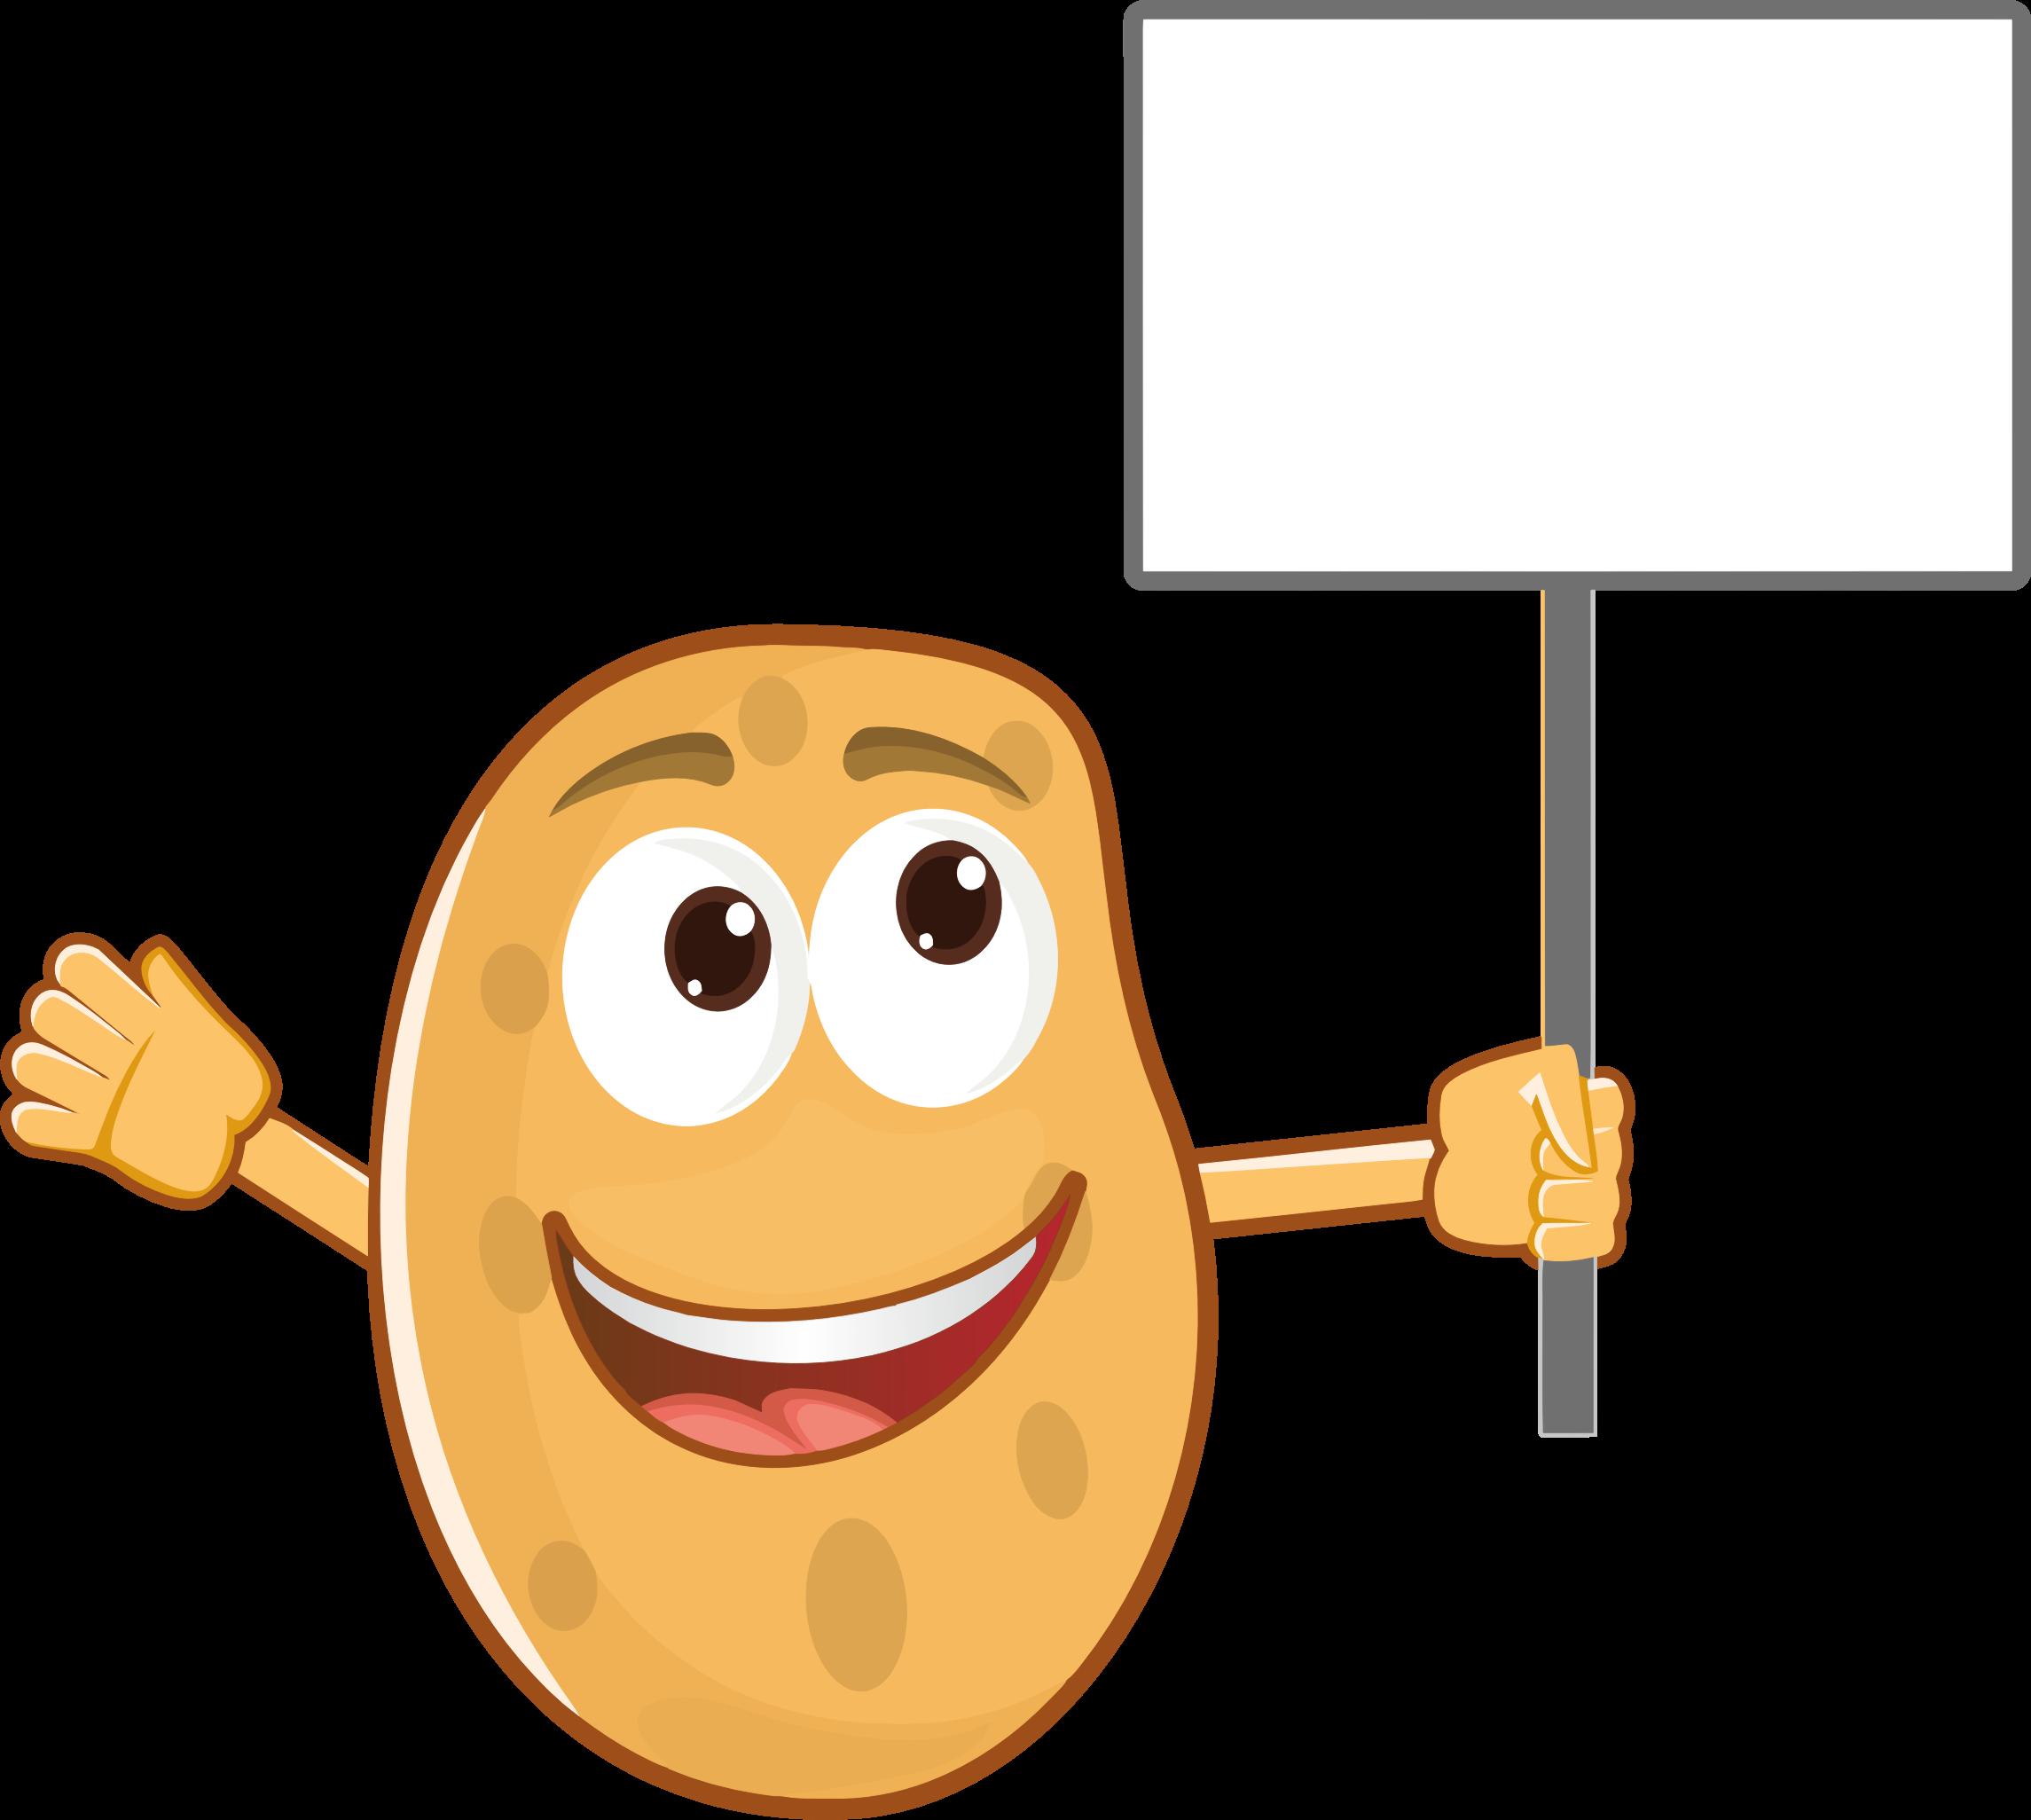 Anthropomorphic holding sign big. Potato clipart smile